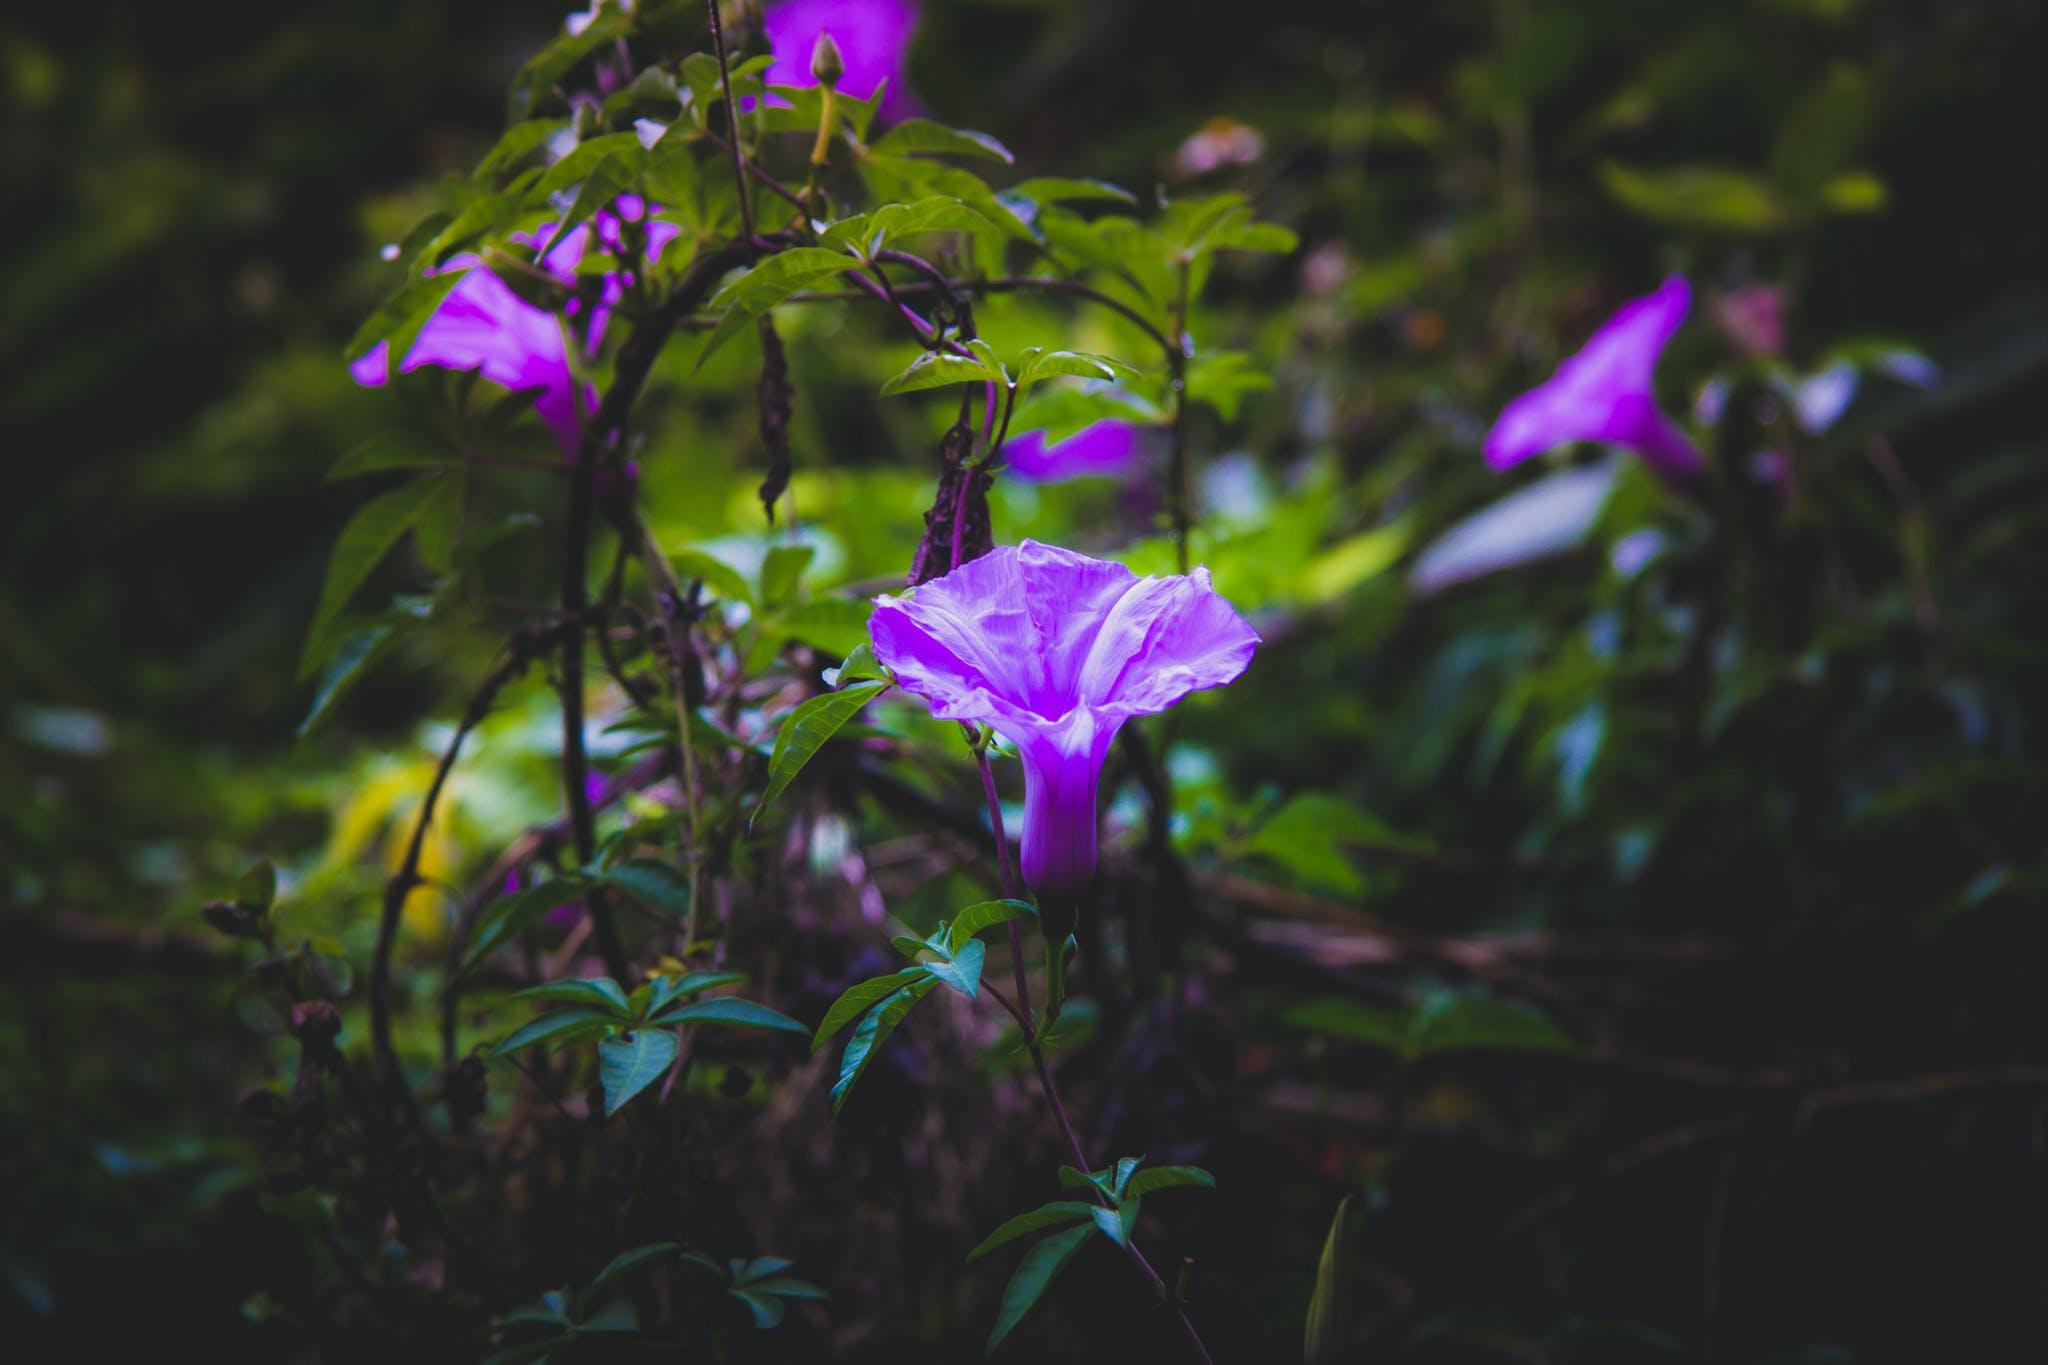 Free stock photo of dewdrops flora  flower  flowers  garden  greenery